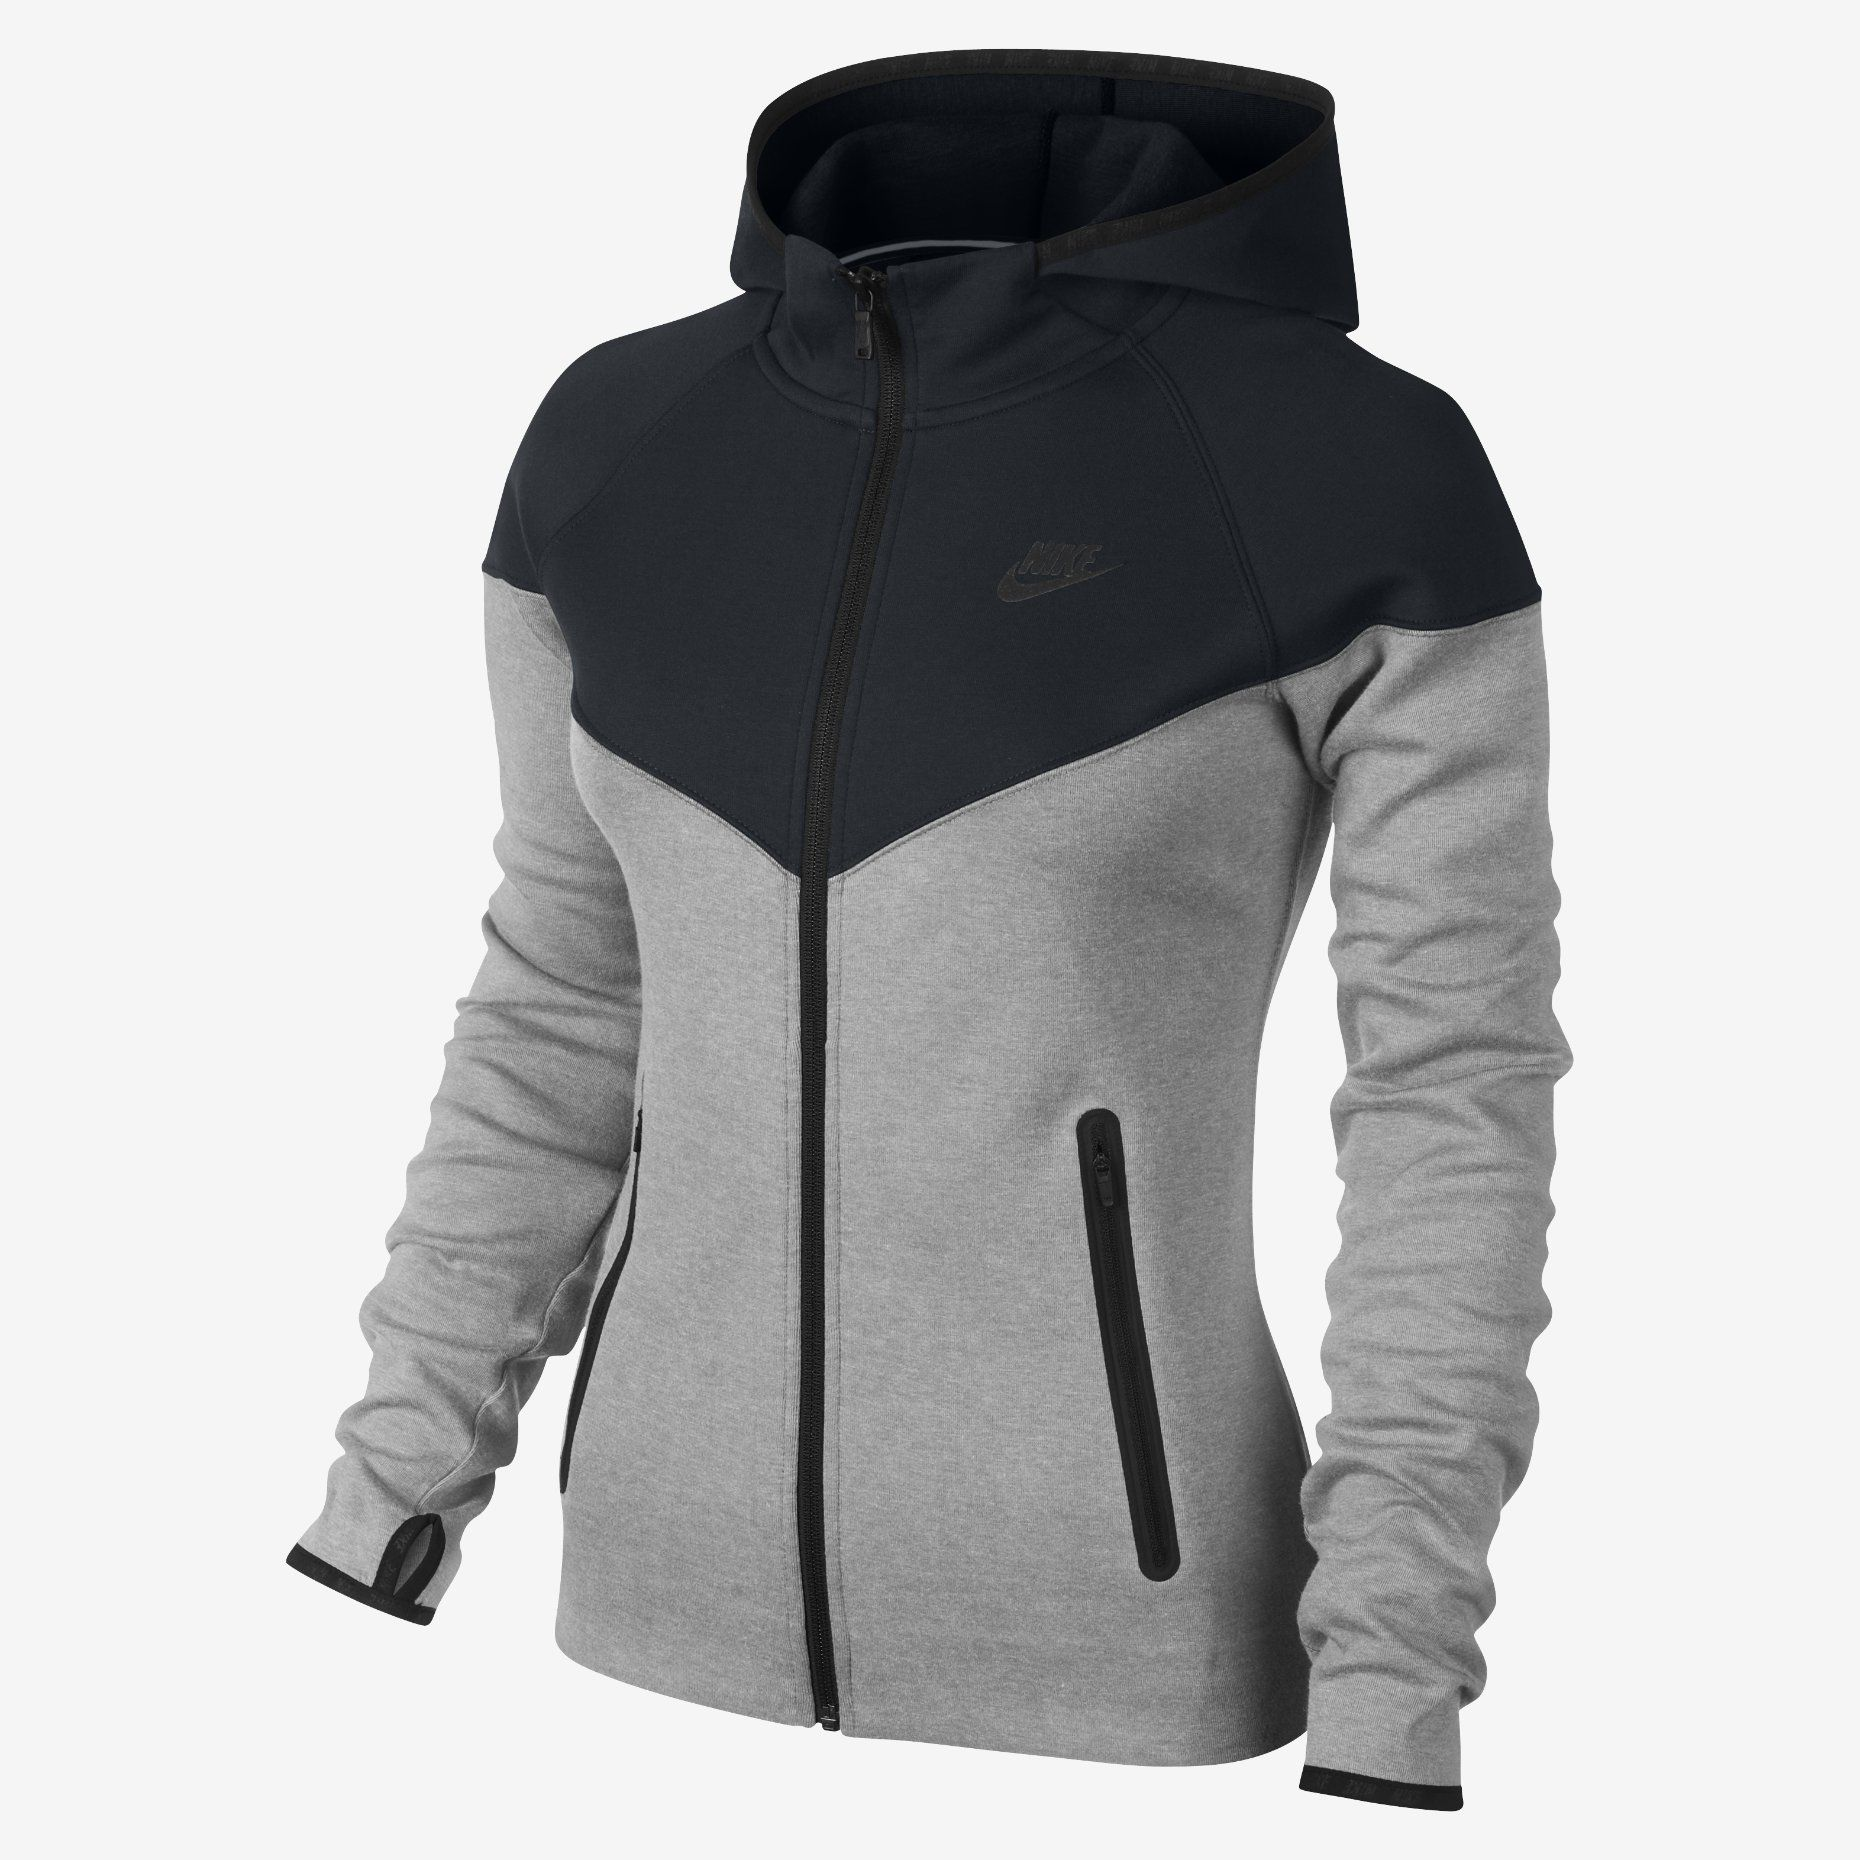 Nike Tech Fleece FullZip Women's Hoodie. Nike Store gym